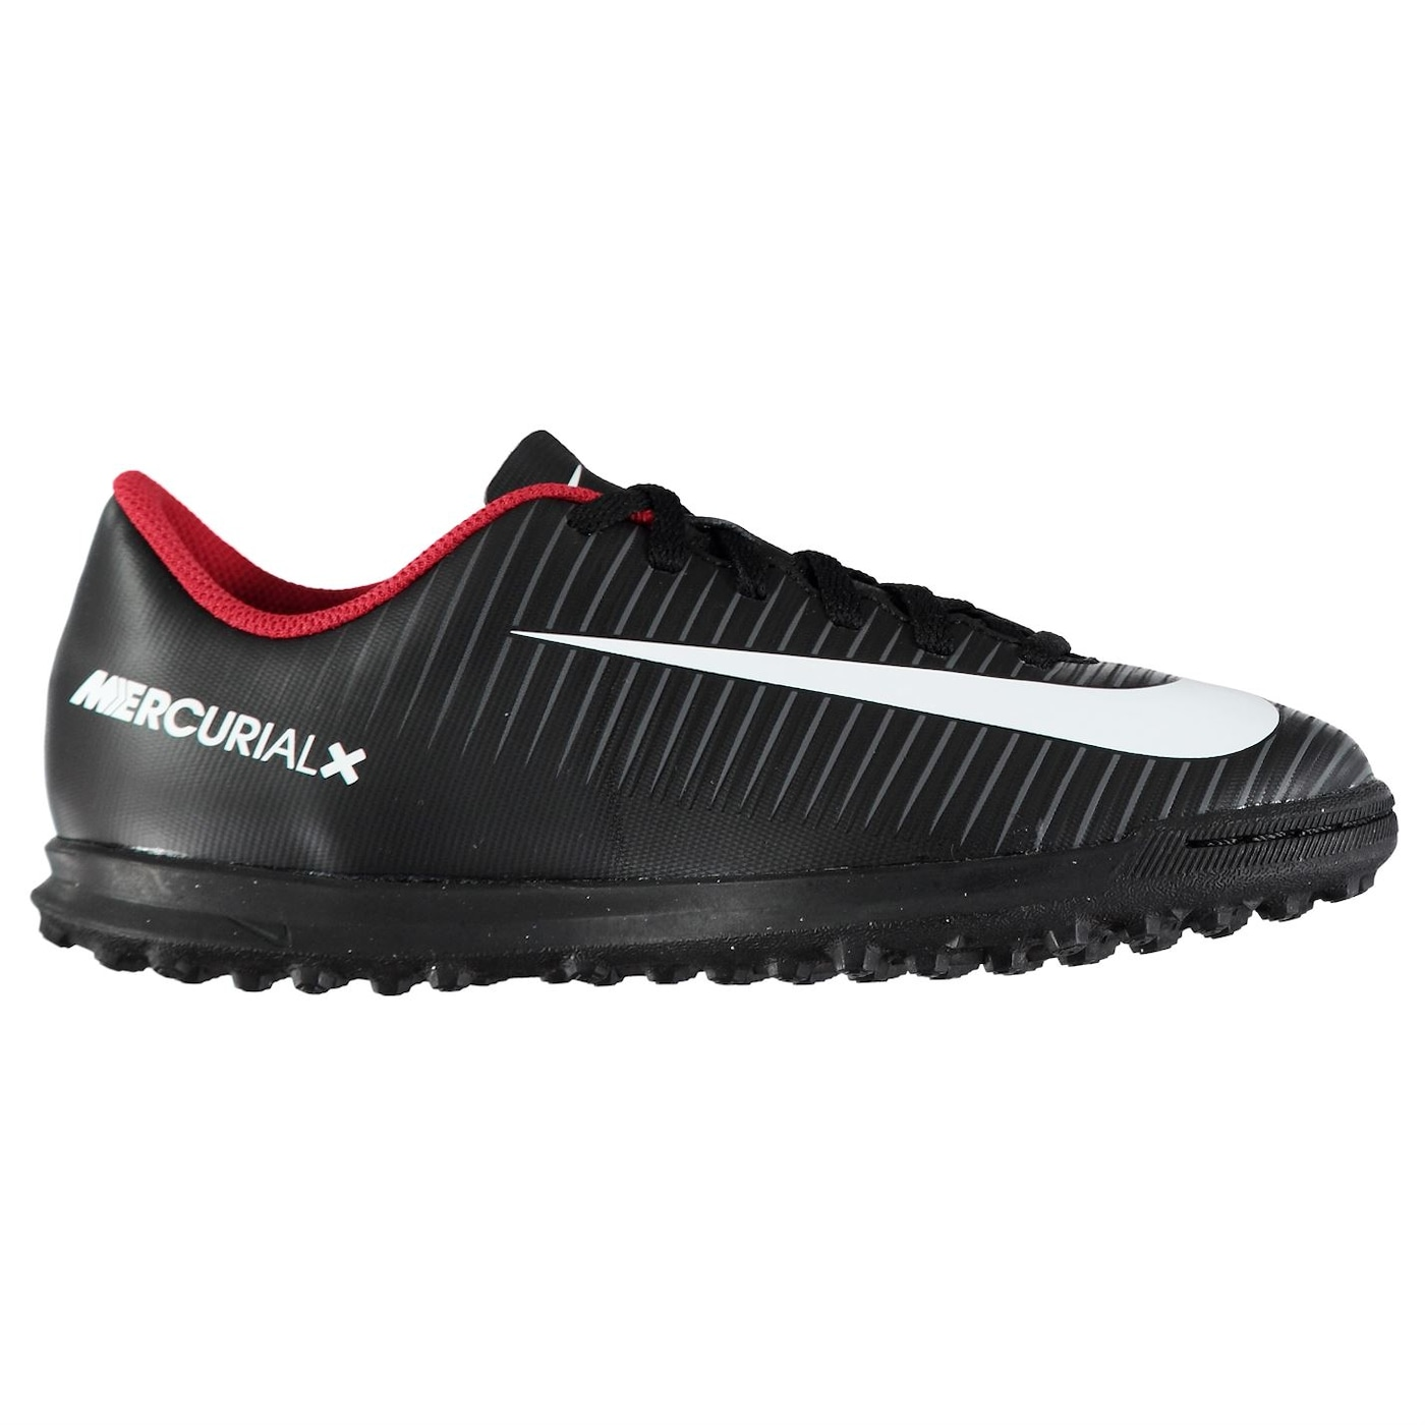 Nike Mercurial Vortex TF Football Boots Junior Boys